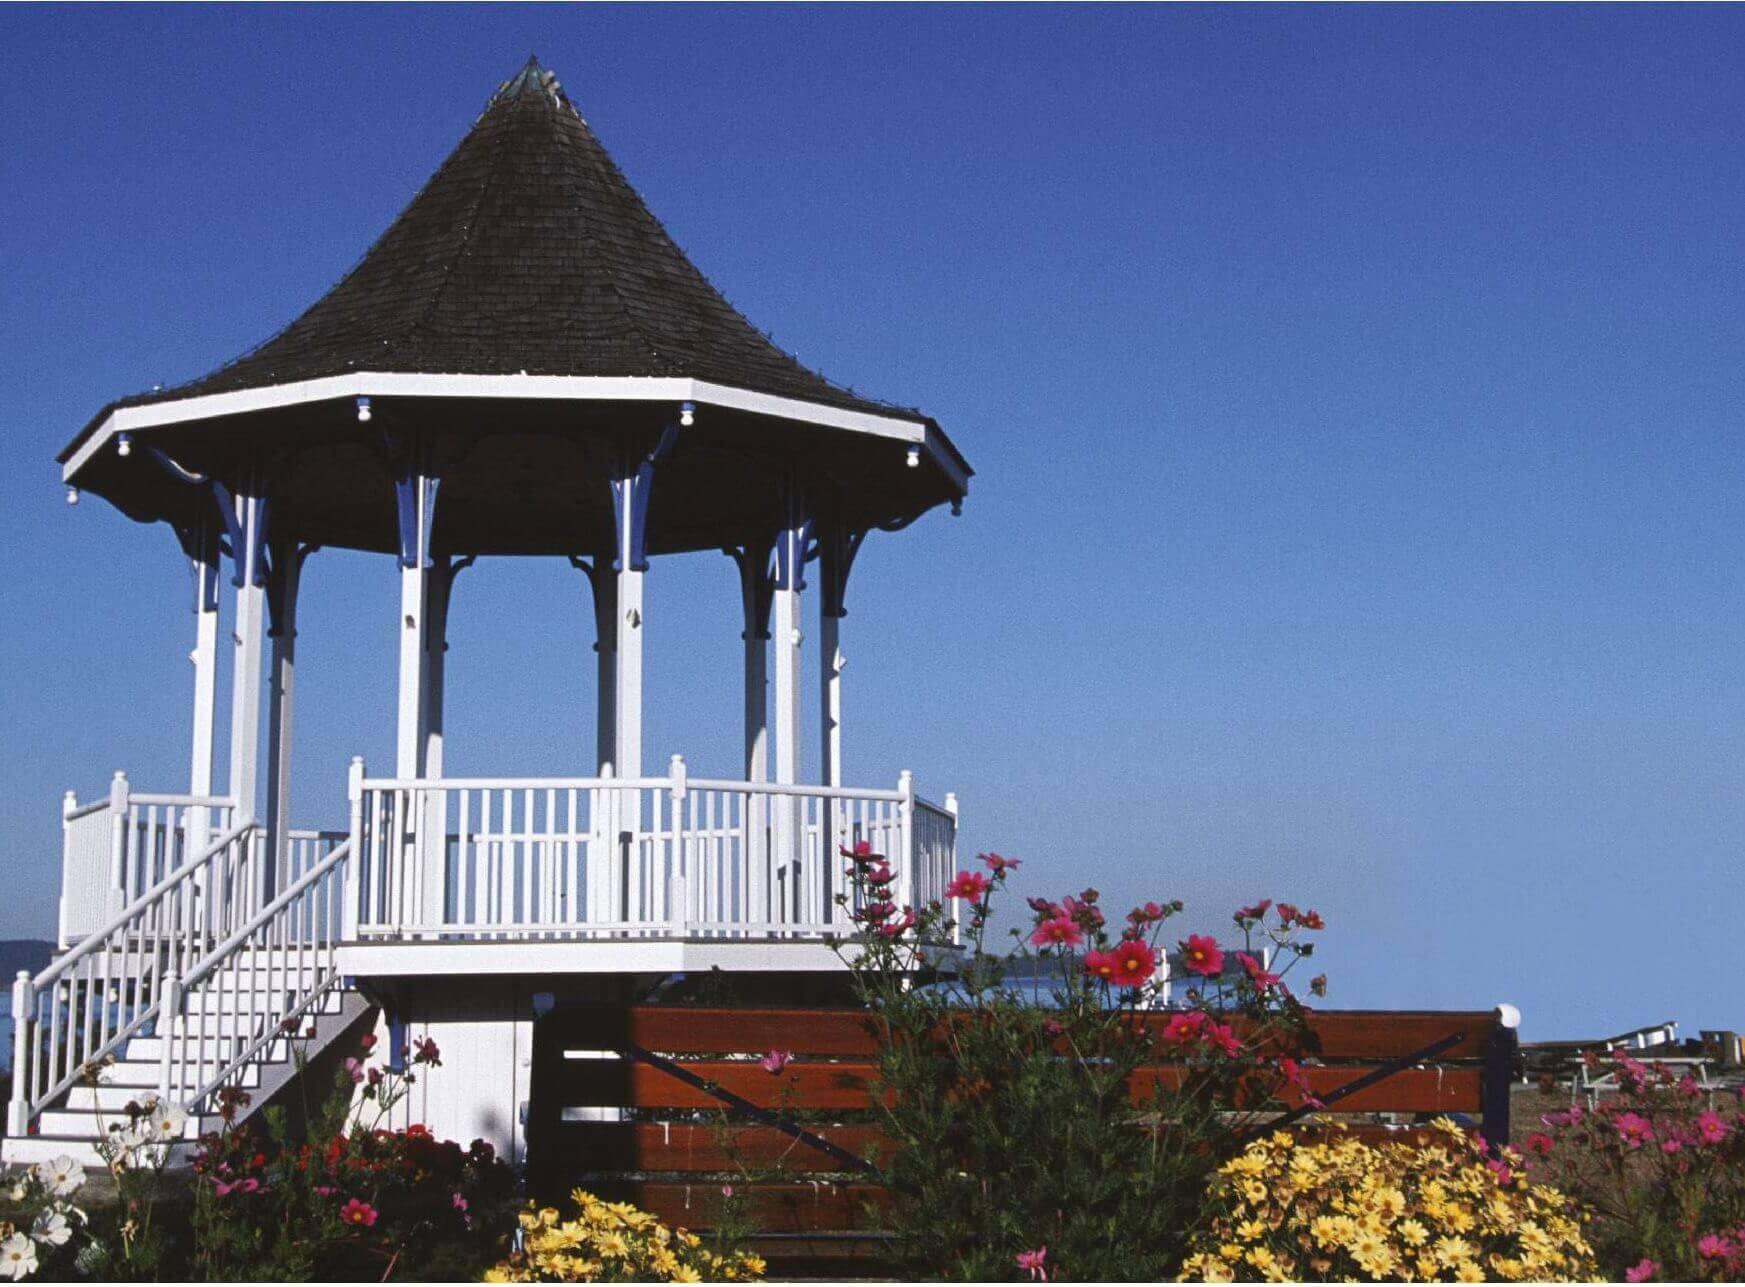 puravankara palm beach amenities features2